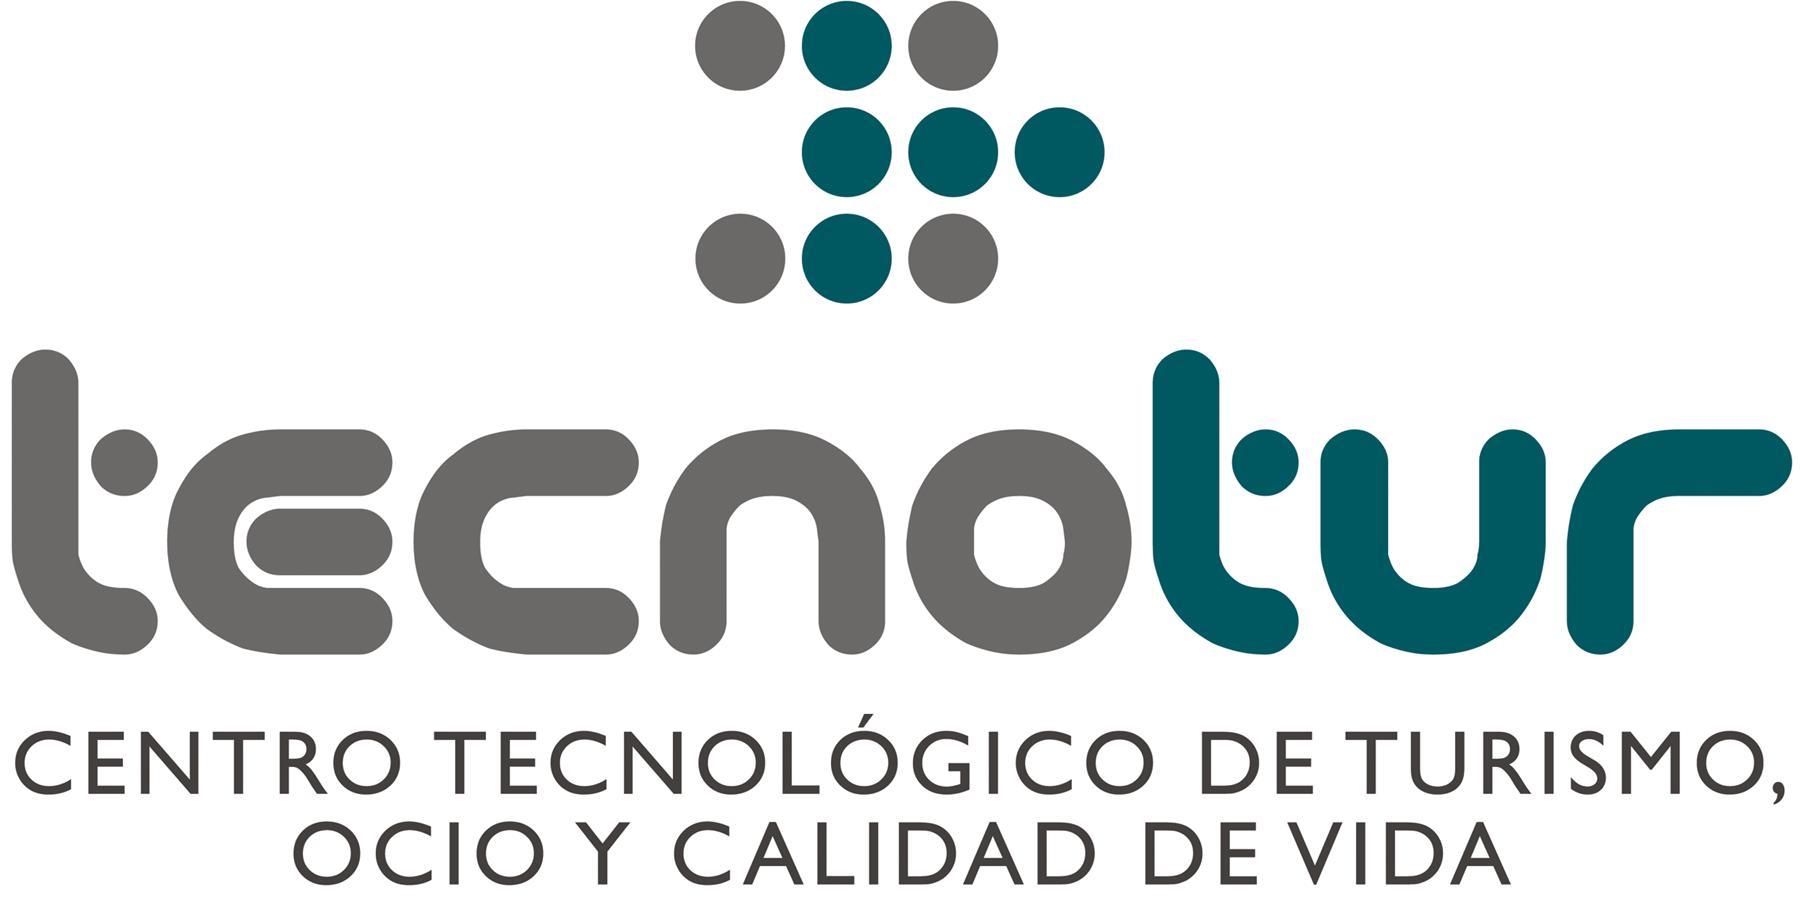 Logo de Tecnotur